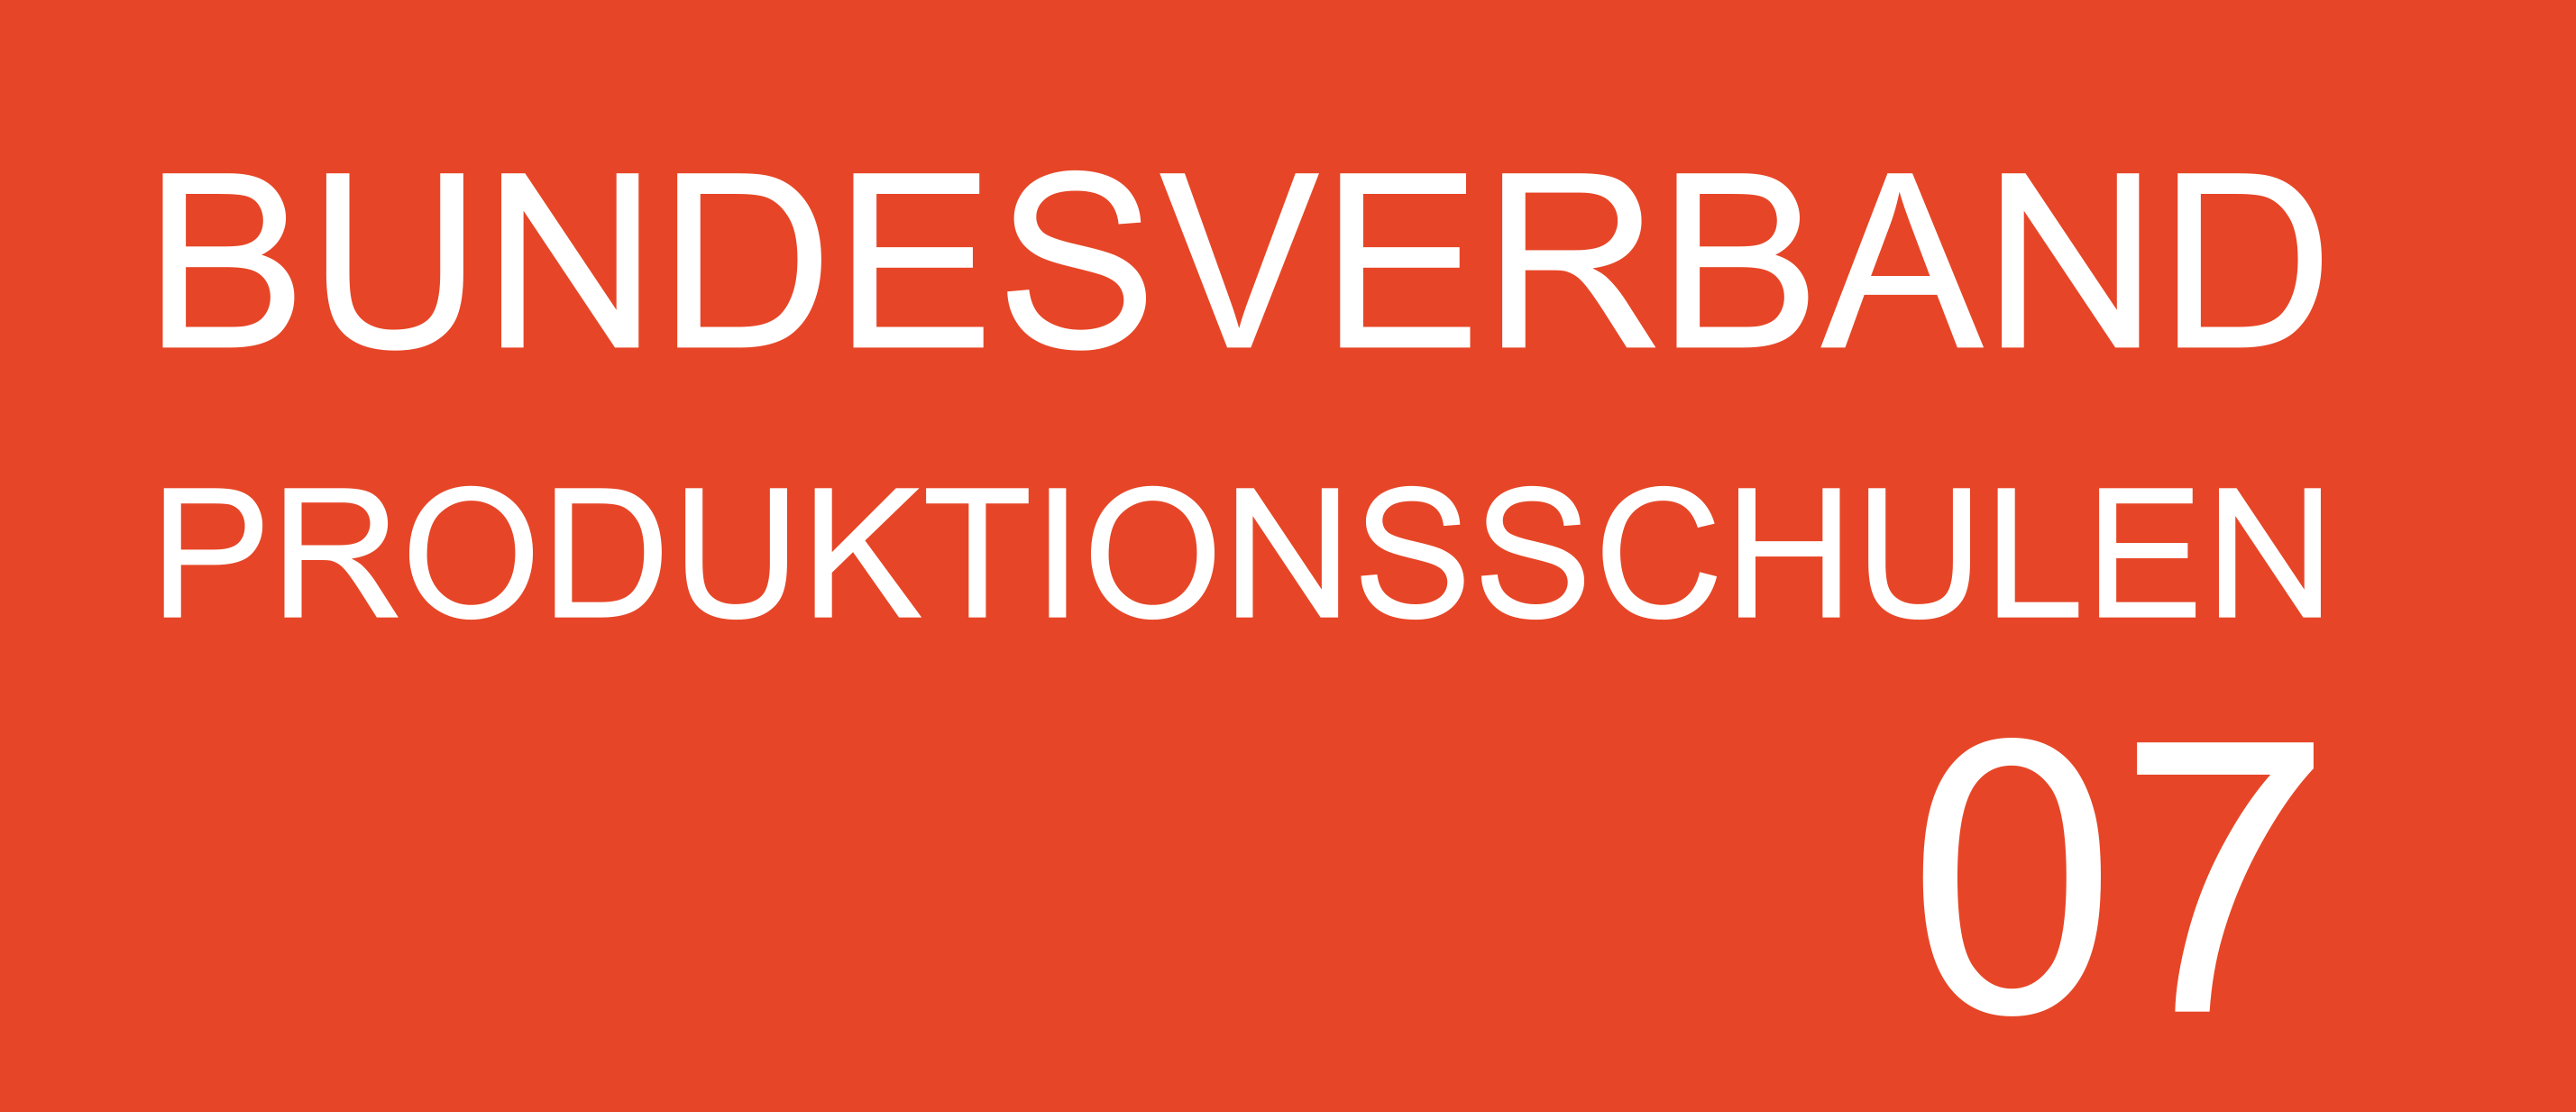 Bundesverband Produktionsschulen e.V.